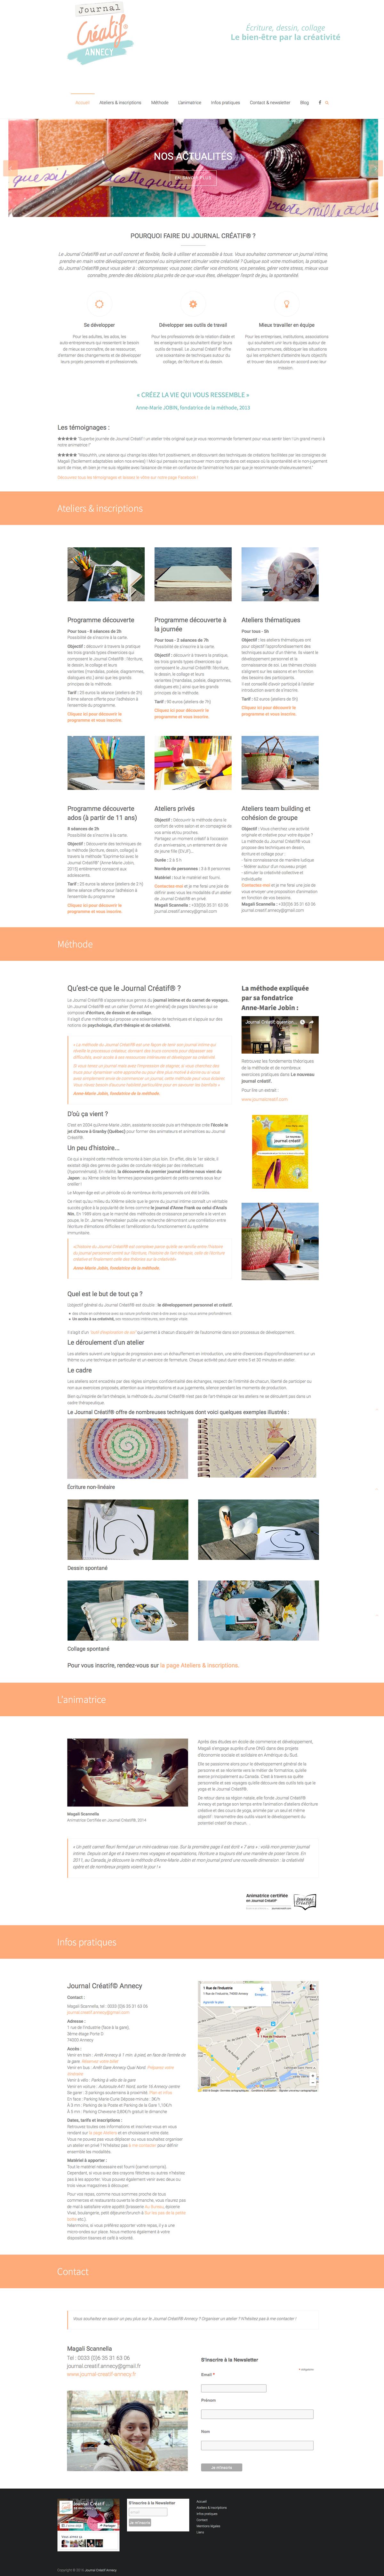 Journal Créatif Annecy - Site Web